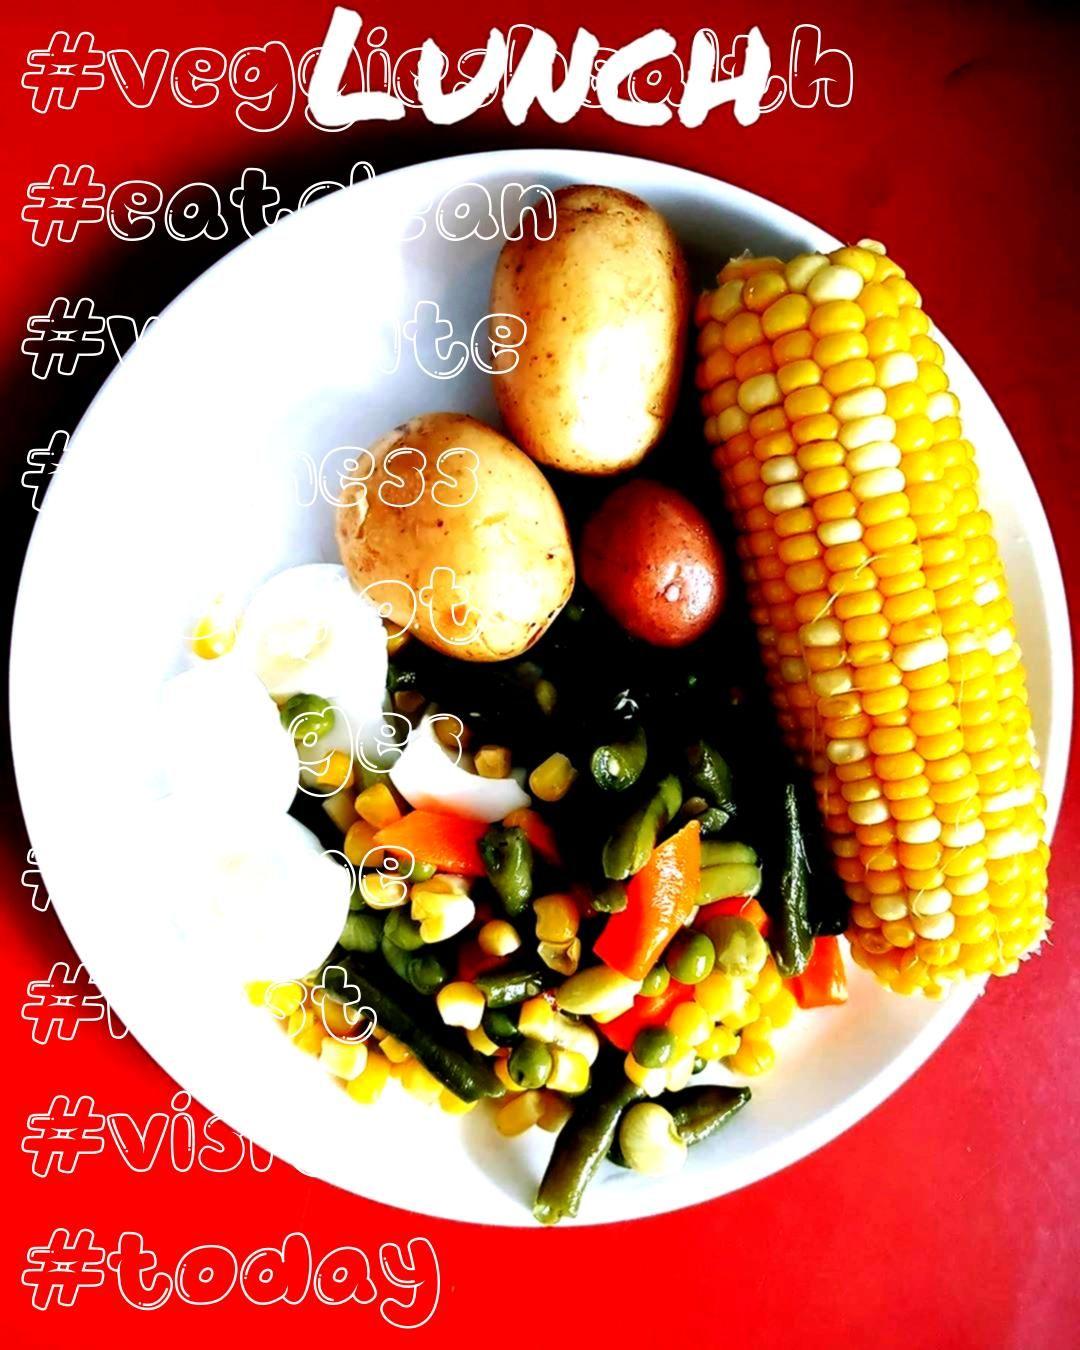 #veggieshealth #eatclean #website #fitness #forgot #images #recipe #least #visit #today #greek #lunc...